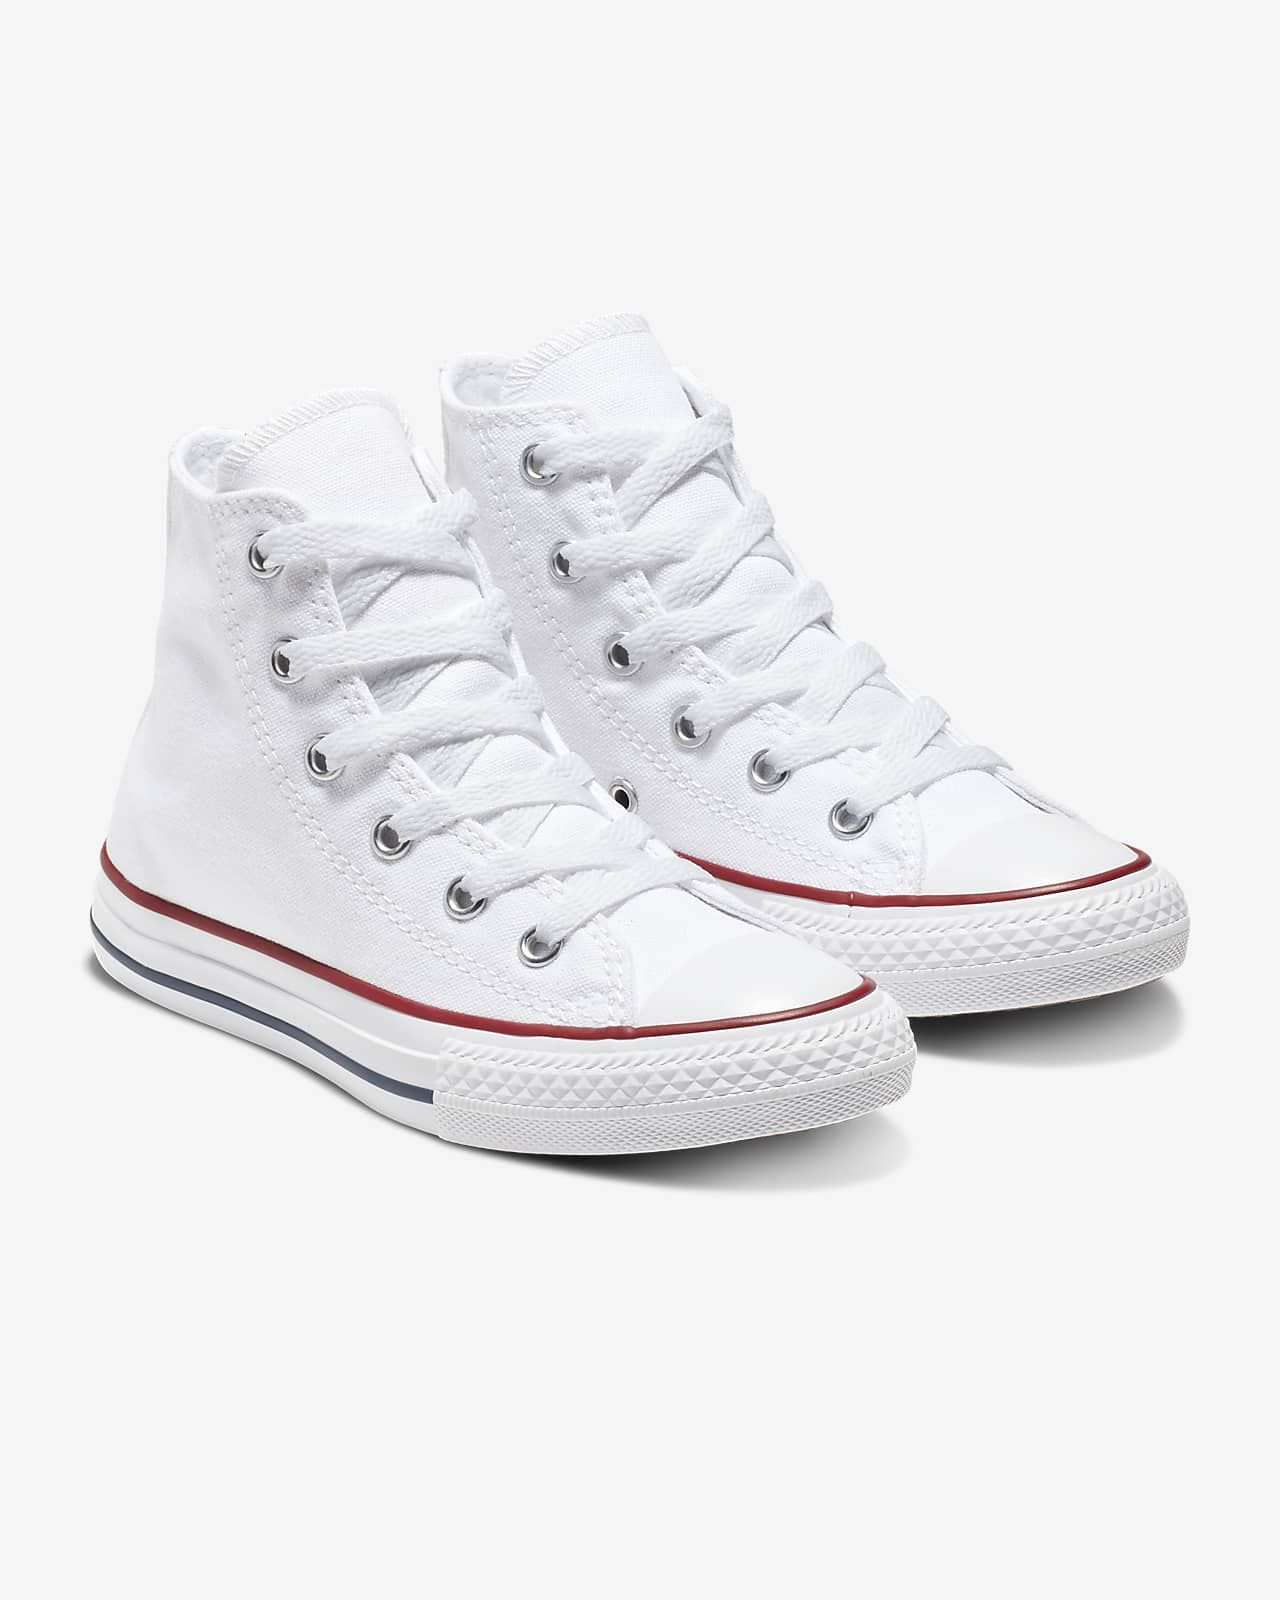 converse flyknit all star nike chuck tailor blanco